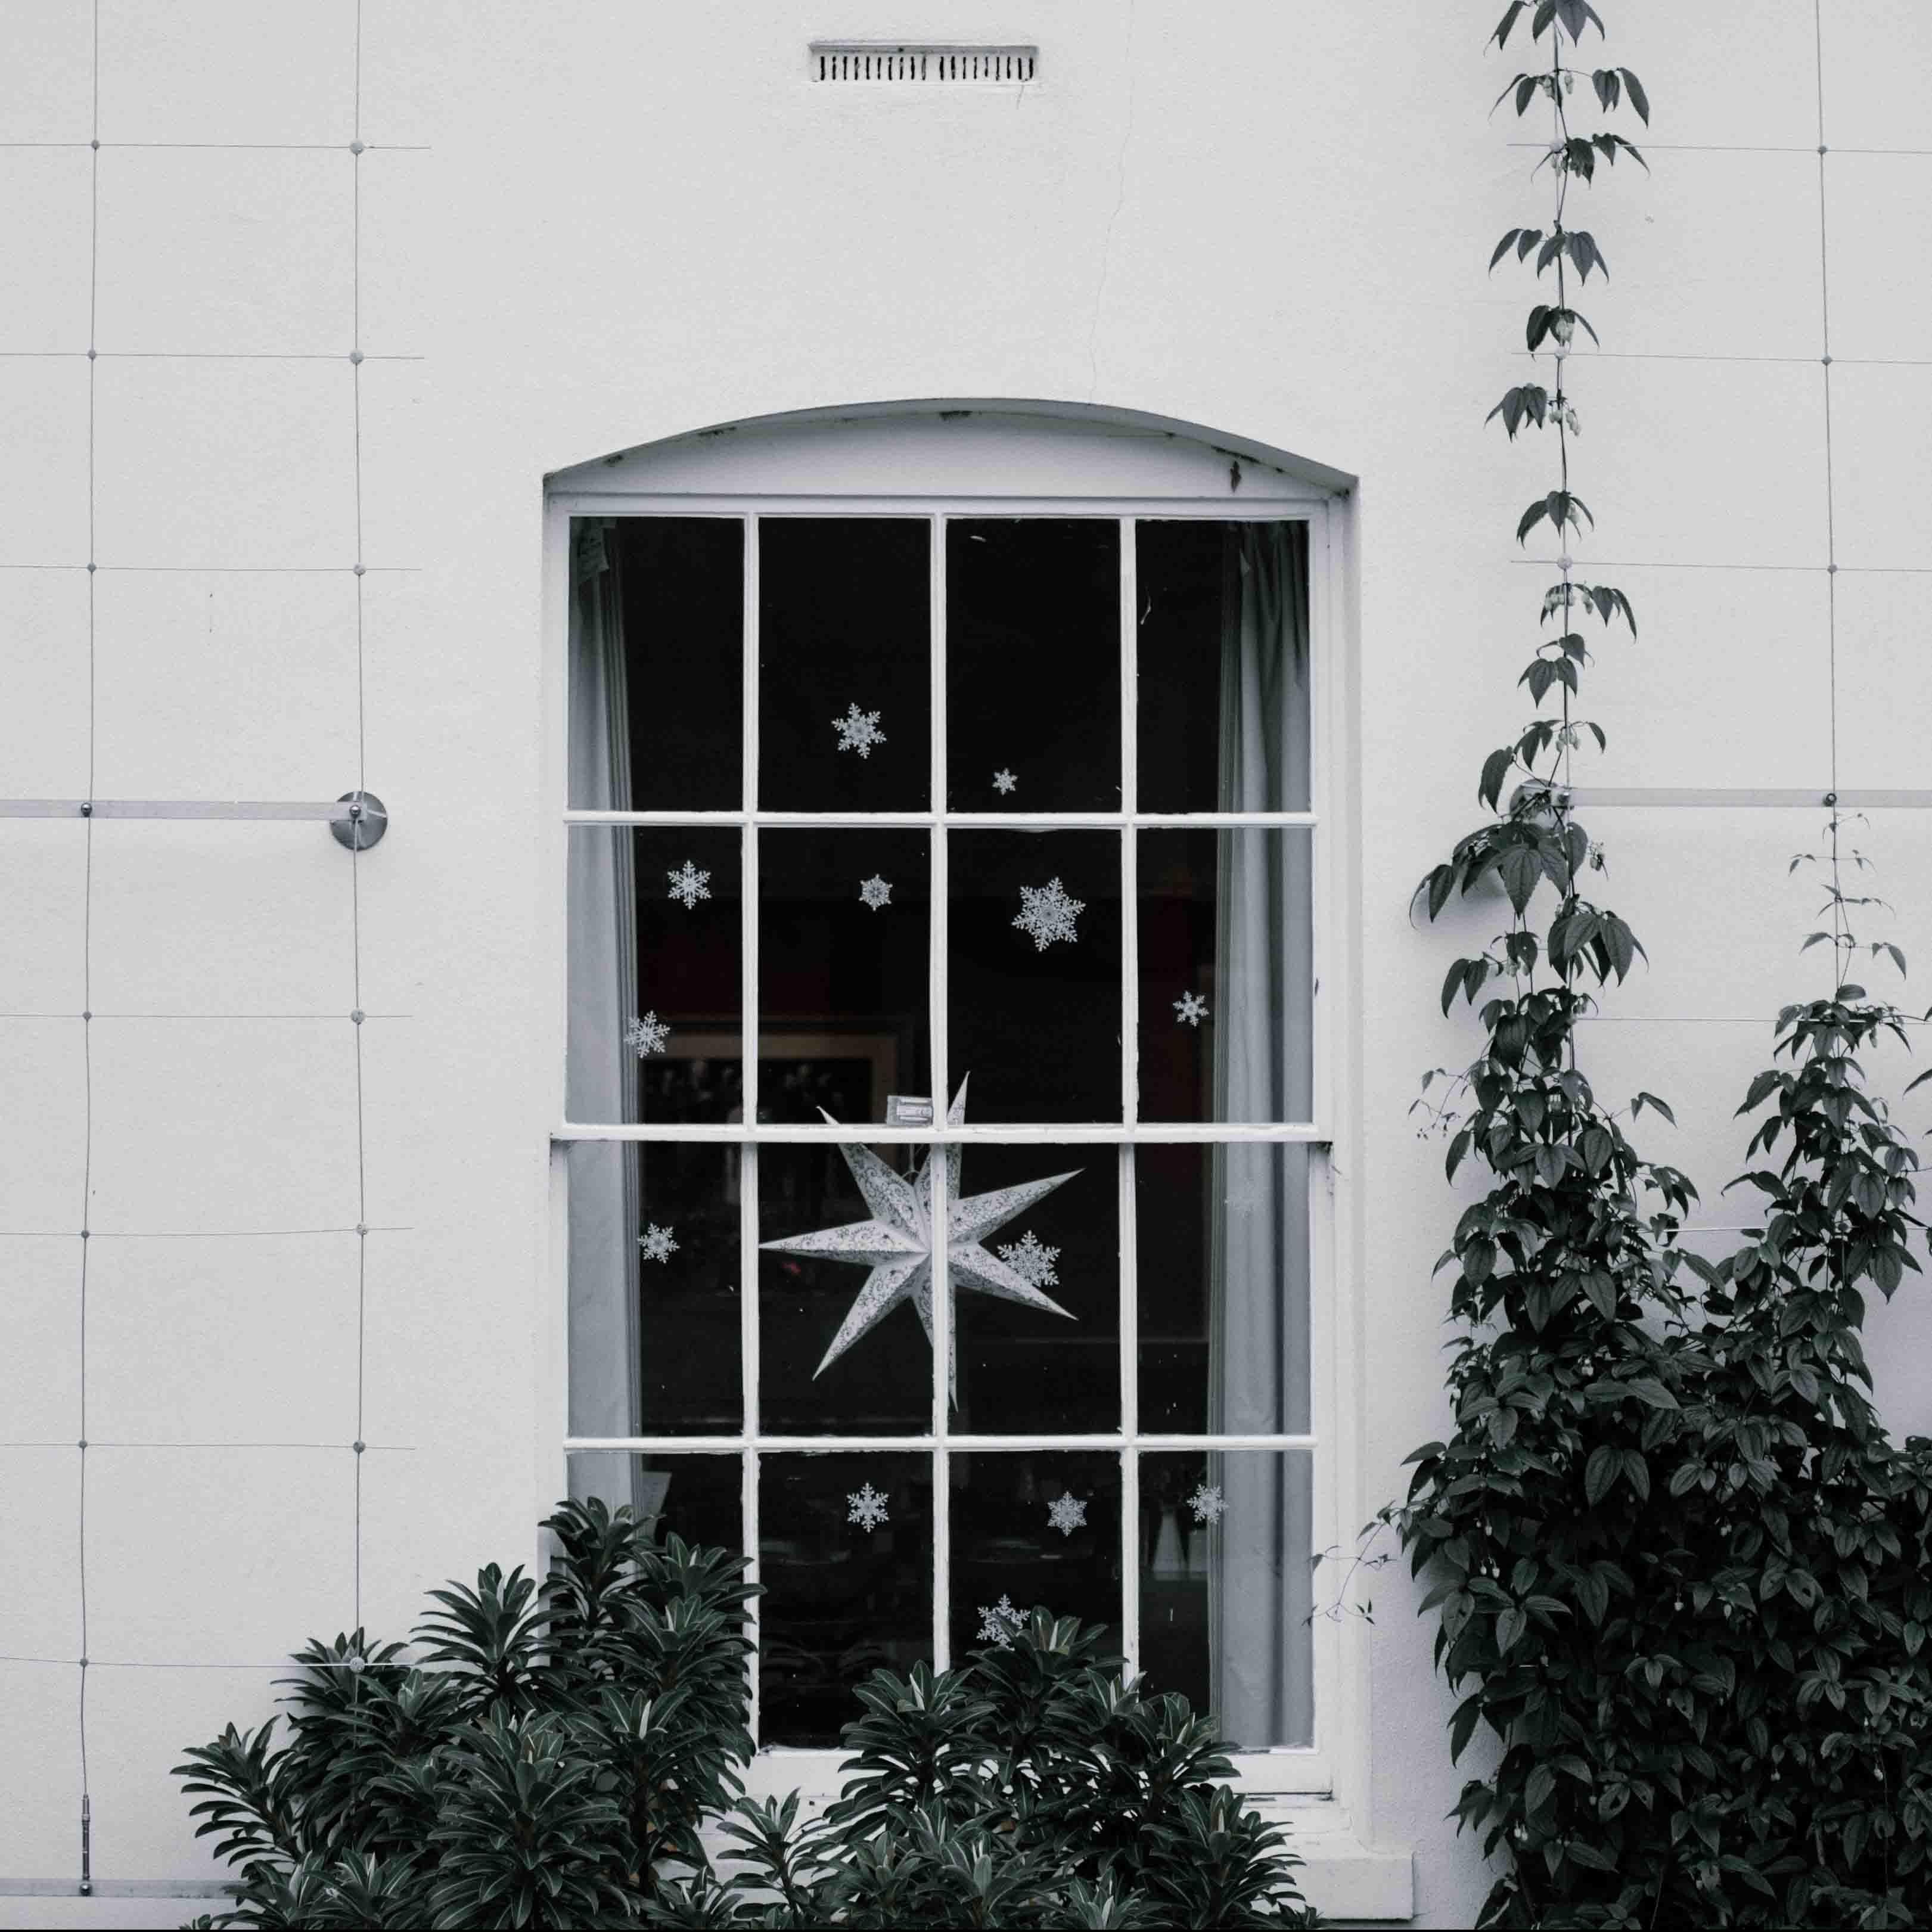 Maps International Christmas Decor Tips 1 Window Image